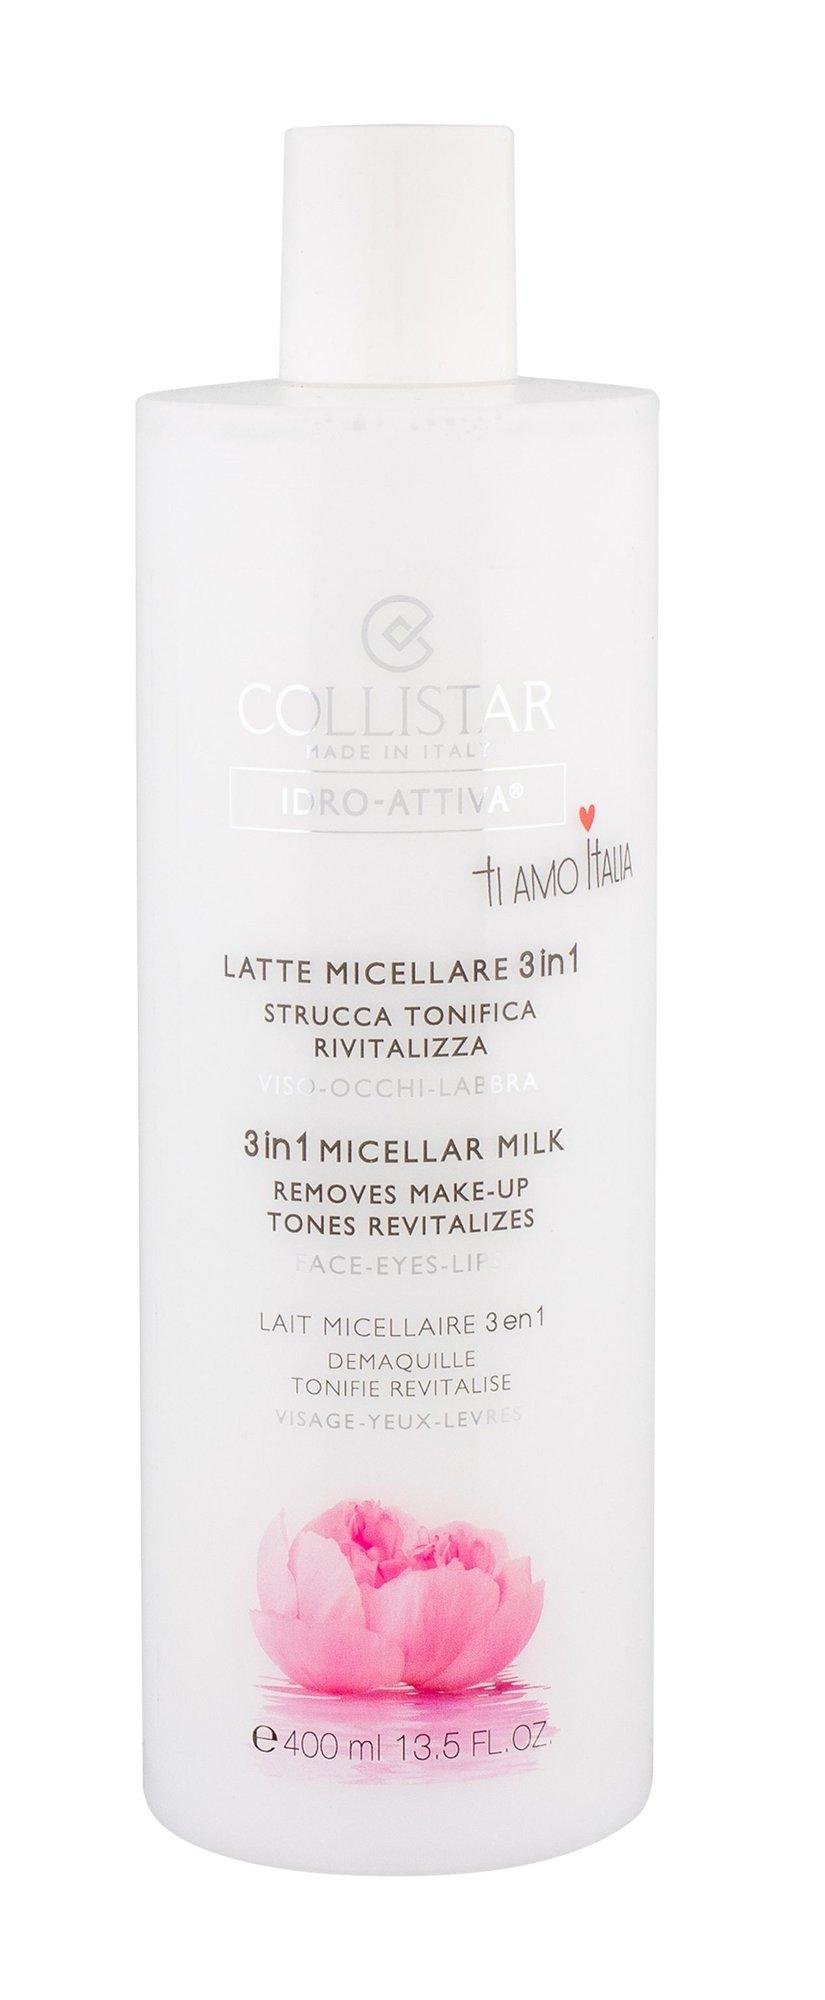 Collistar Idro-Attiva Micellar Water 400ml